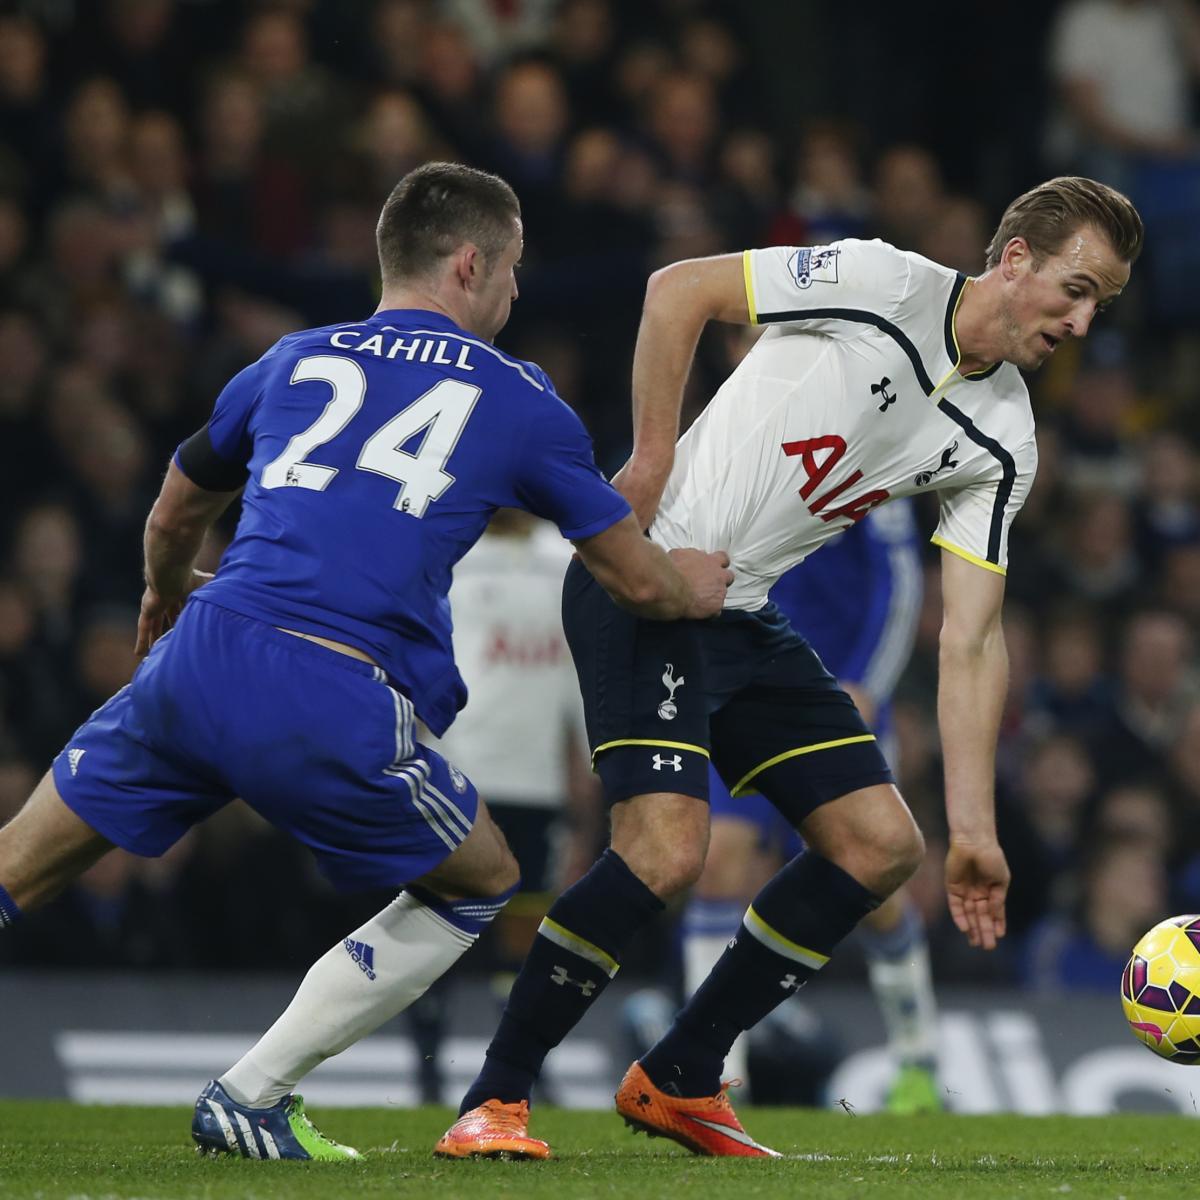 Ajax Vs Tottenham Hotspur Preview Live Stream Tv Info: Tottenham Vs. Chelsea: Date, Time, Live Stream, TV Info